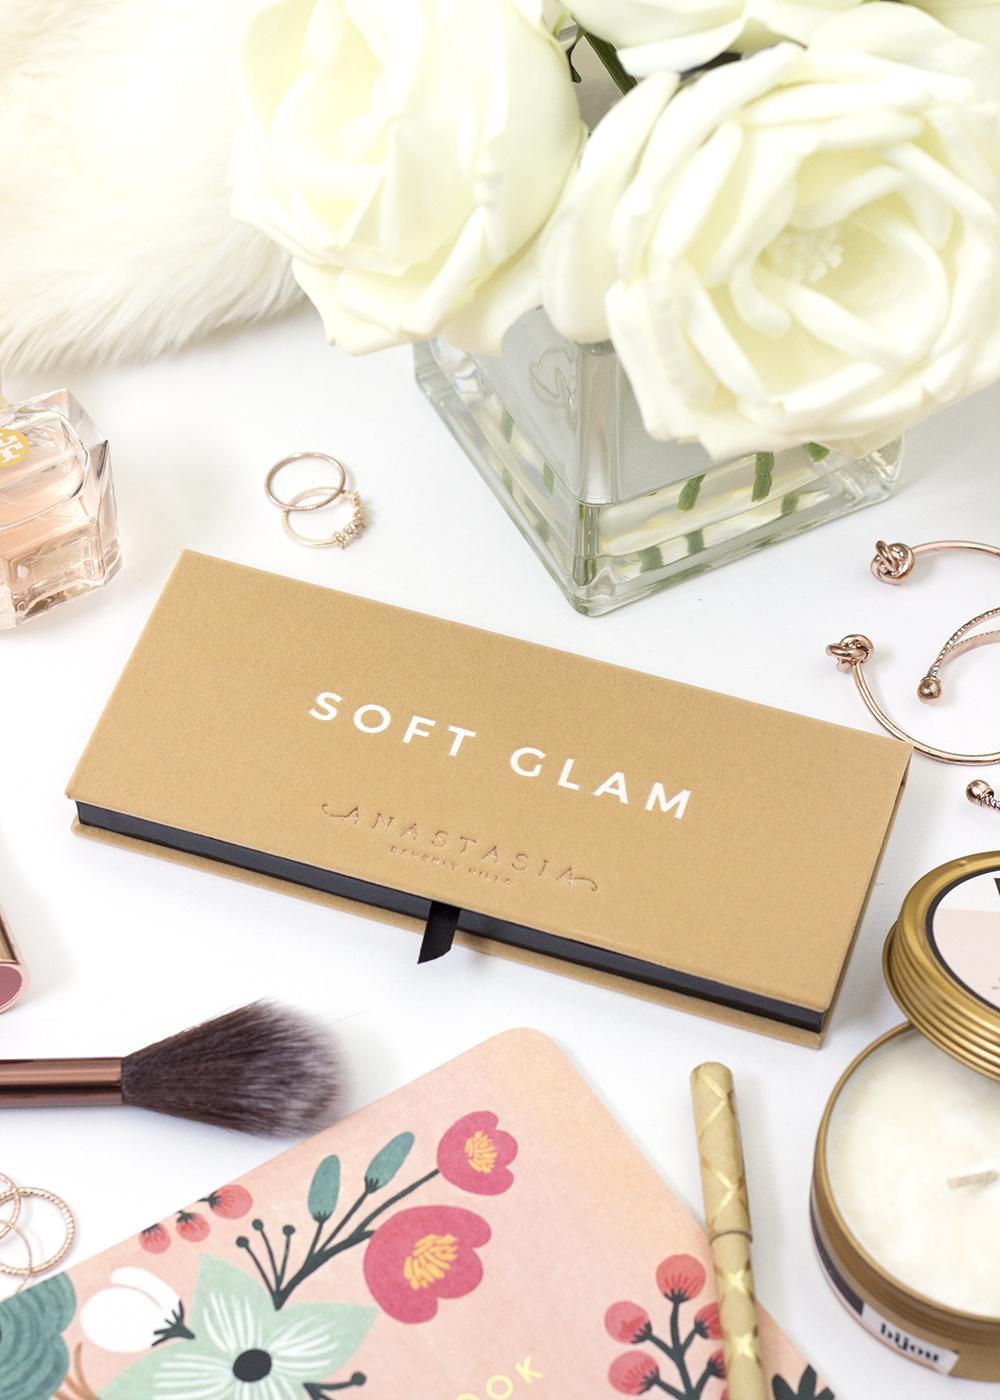 Anastasia Beverly Hills Soft Glam Palette Exterior Packaging